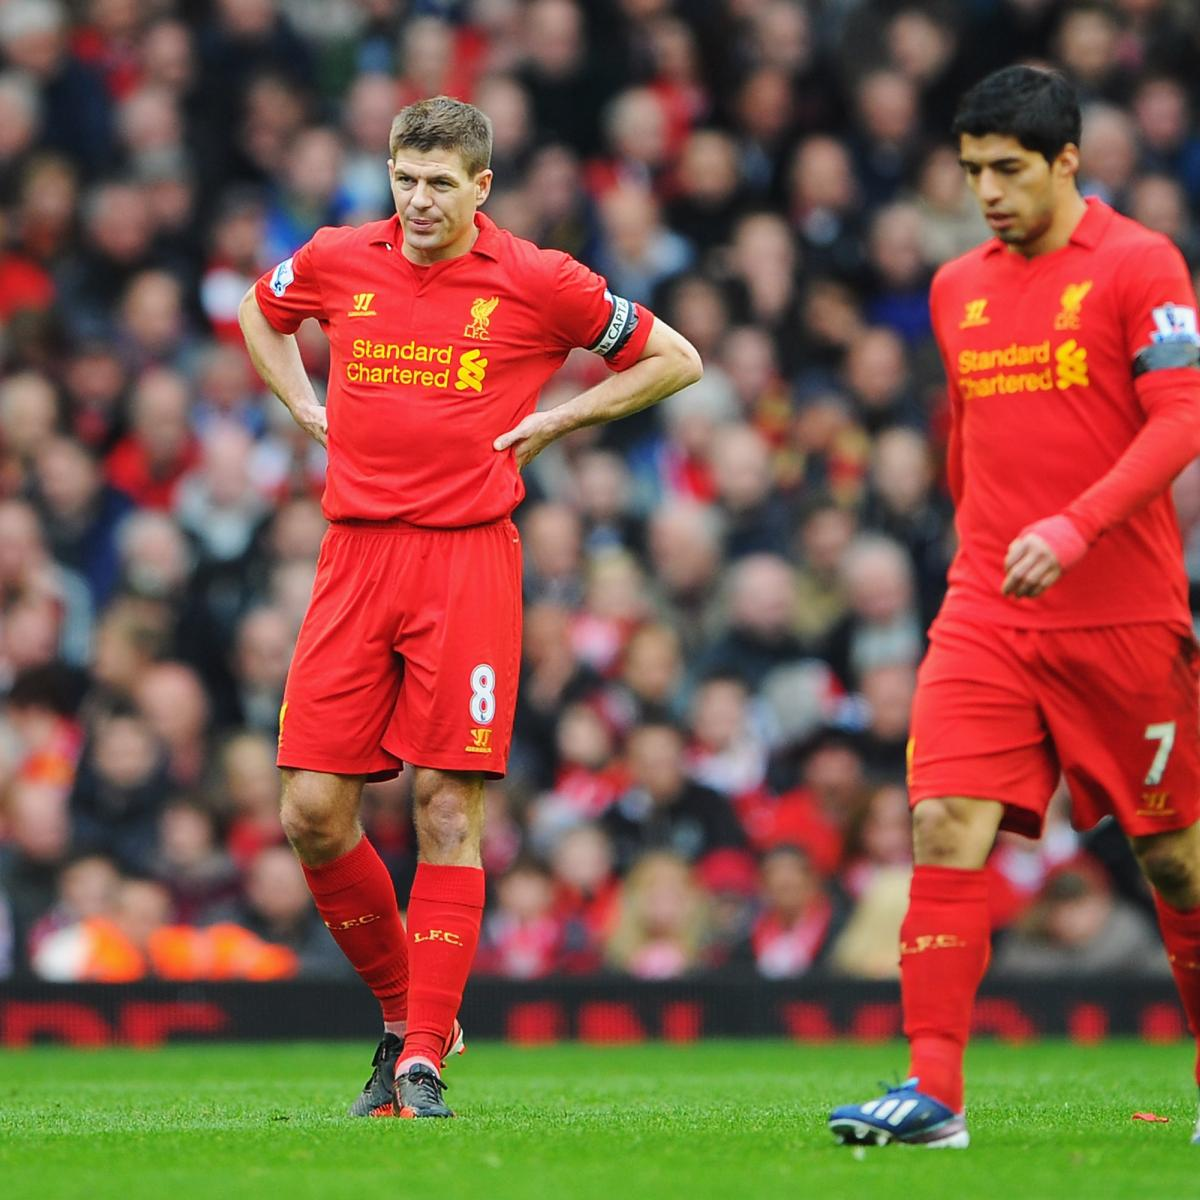 Luis Suarez And Steven Gerrard Reunited: Steven Gerrard Reveals Luis Suarez Talks, Discusses Real